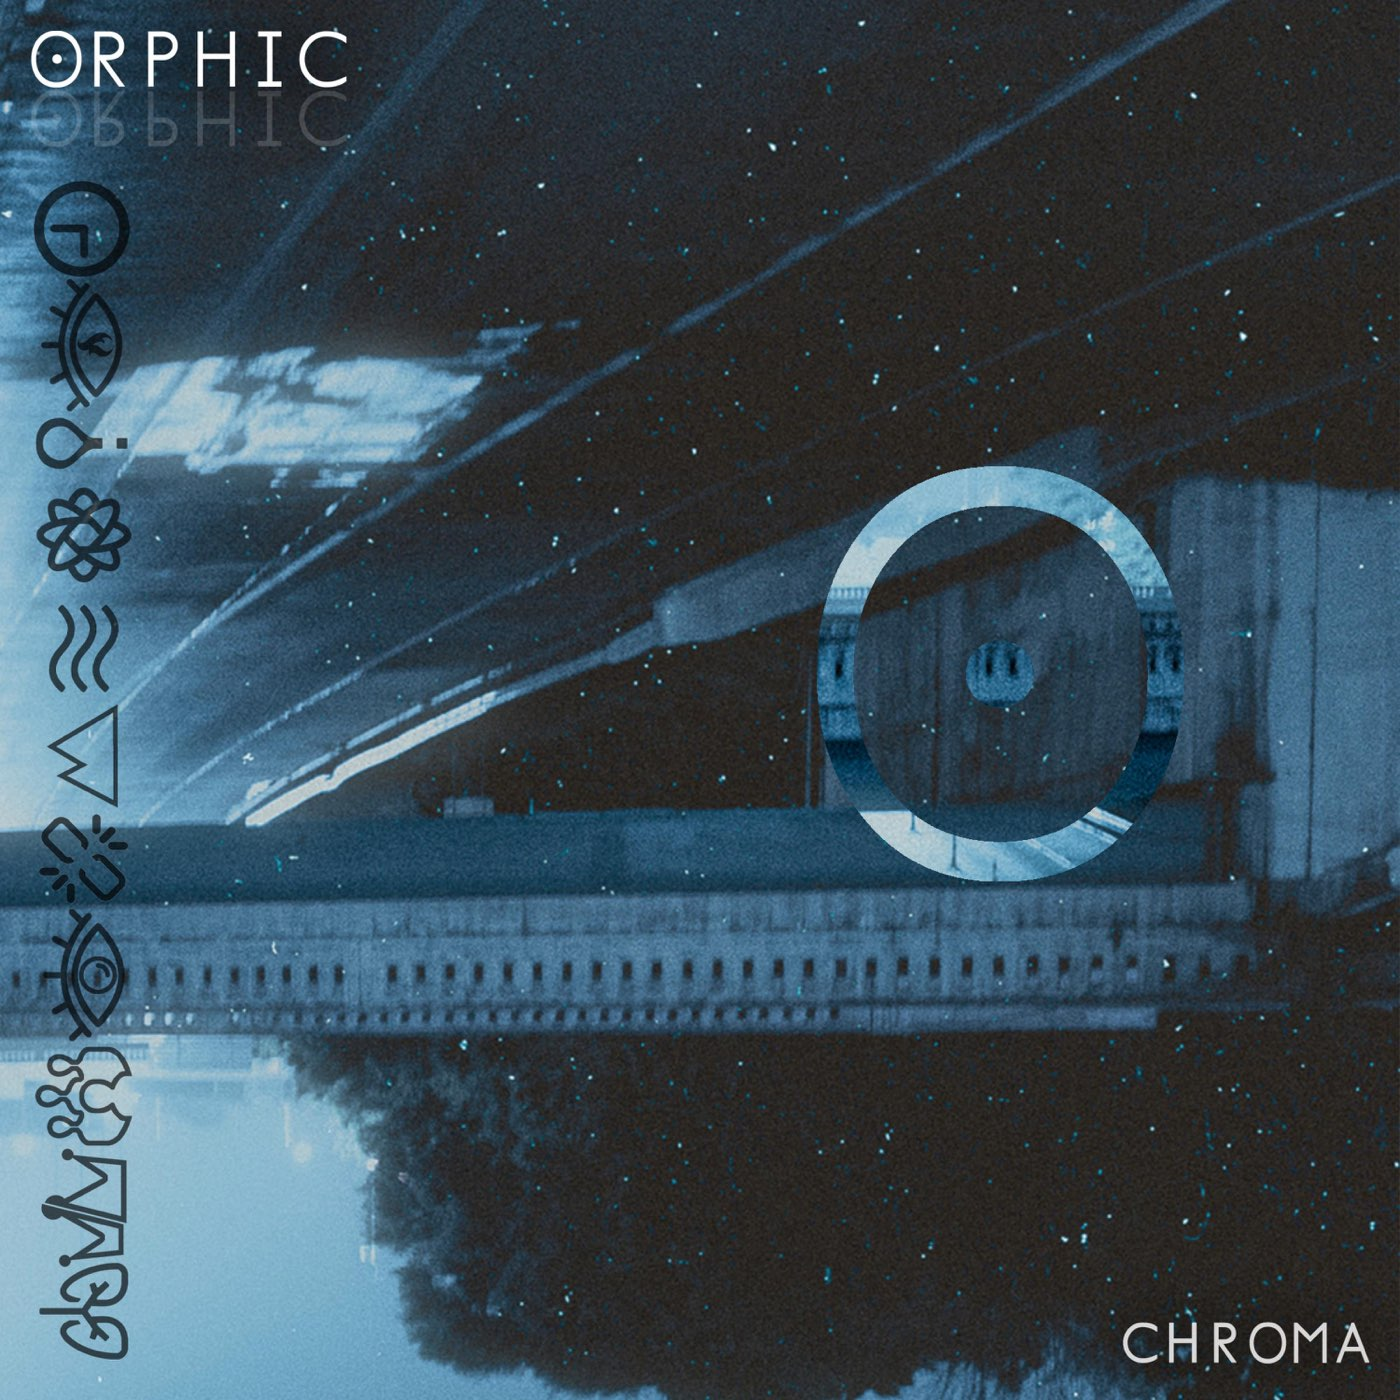 Orphic - Chroma (2020)